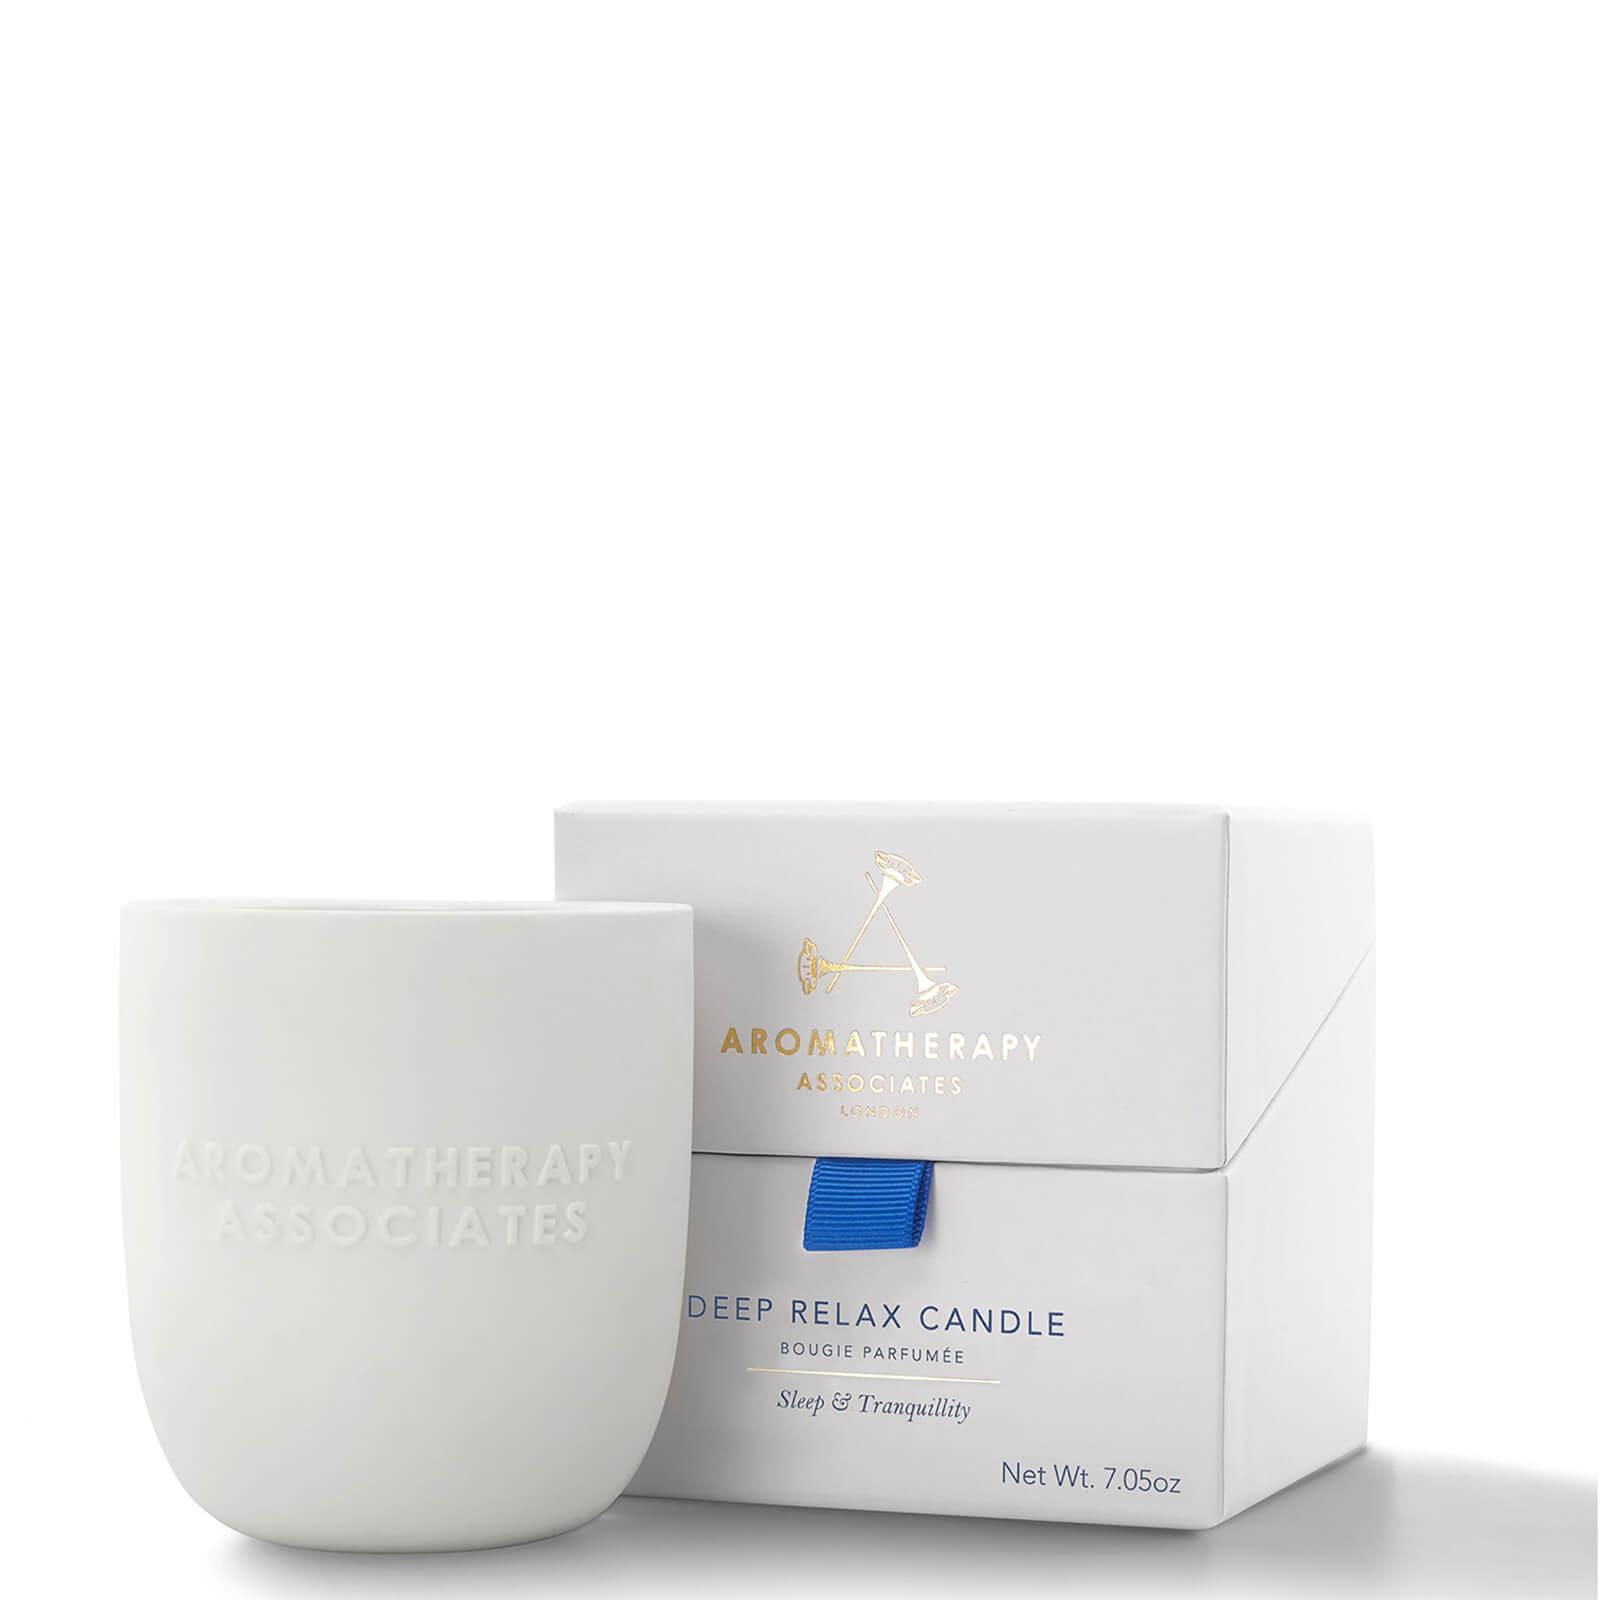 Aromatherapy Associates Deep Relax Candle 200g